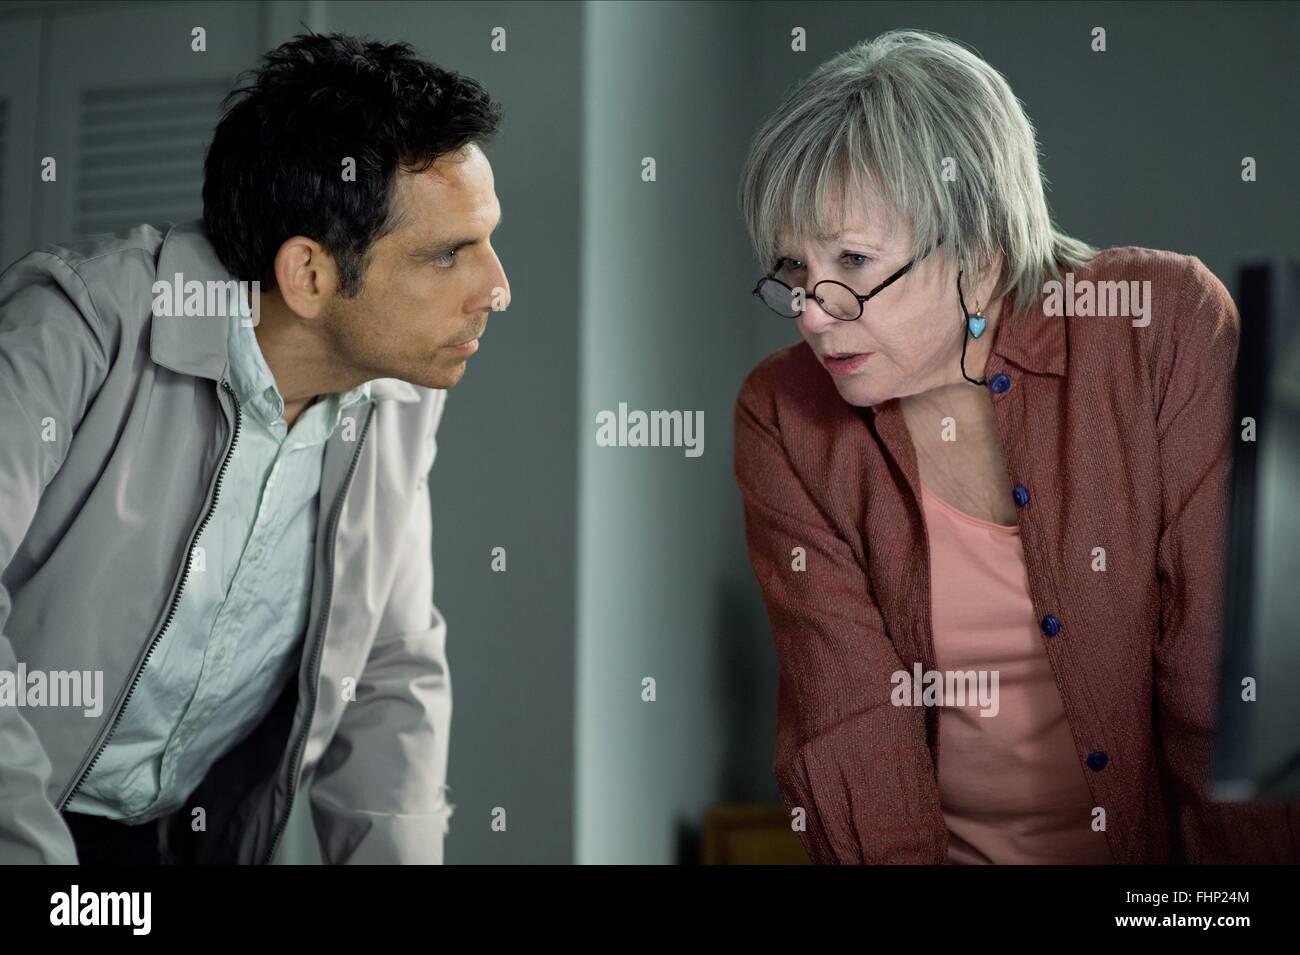 Ben Stiller Shirley Maclaine The Secret Life Of Walter Mitty 2013 Stock Photo Alamy